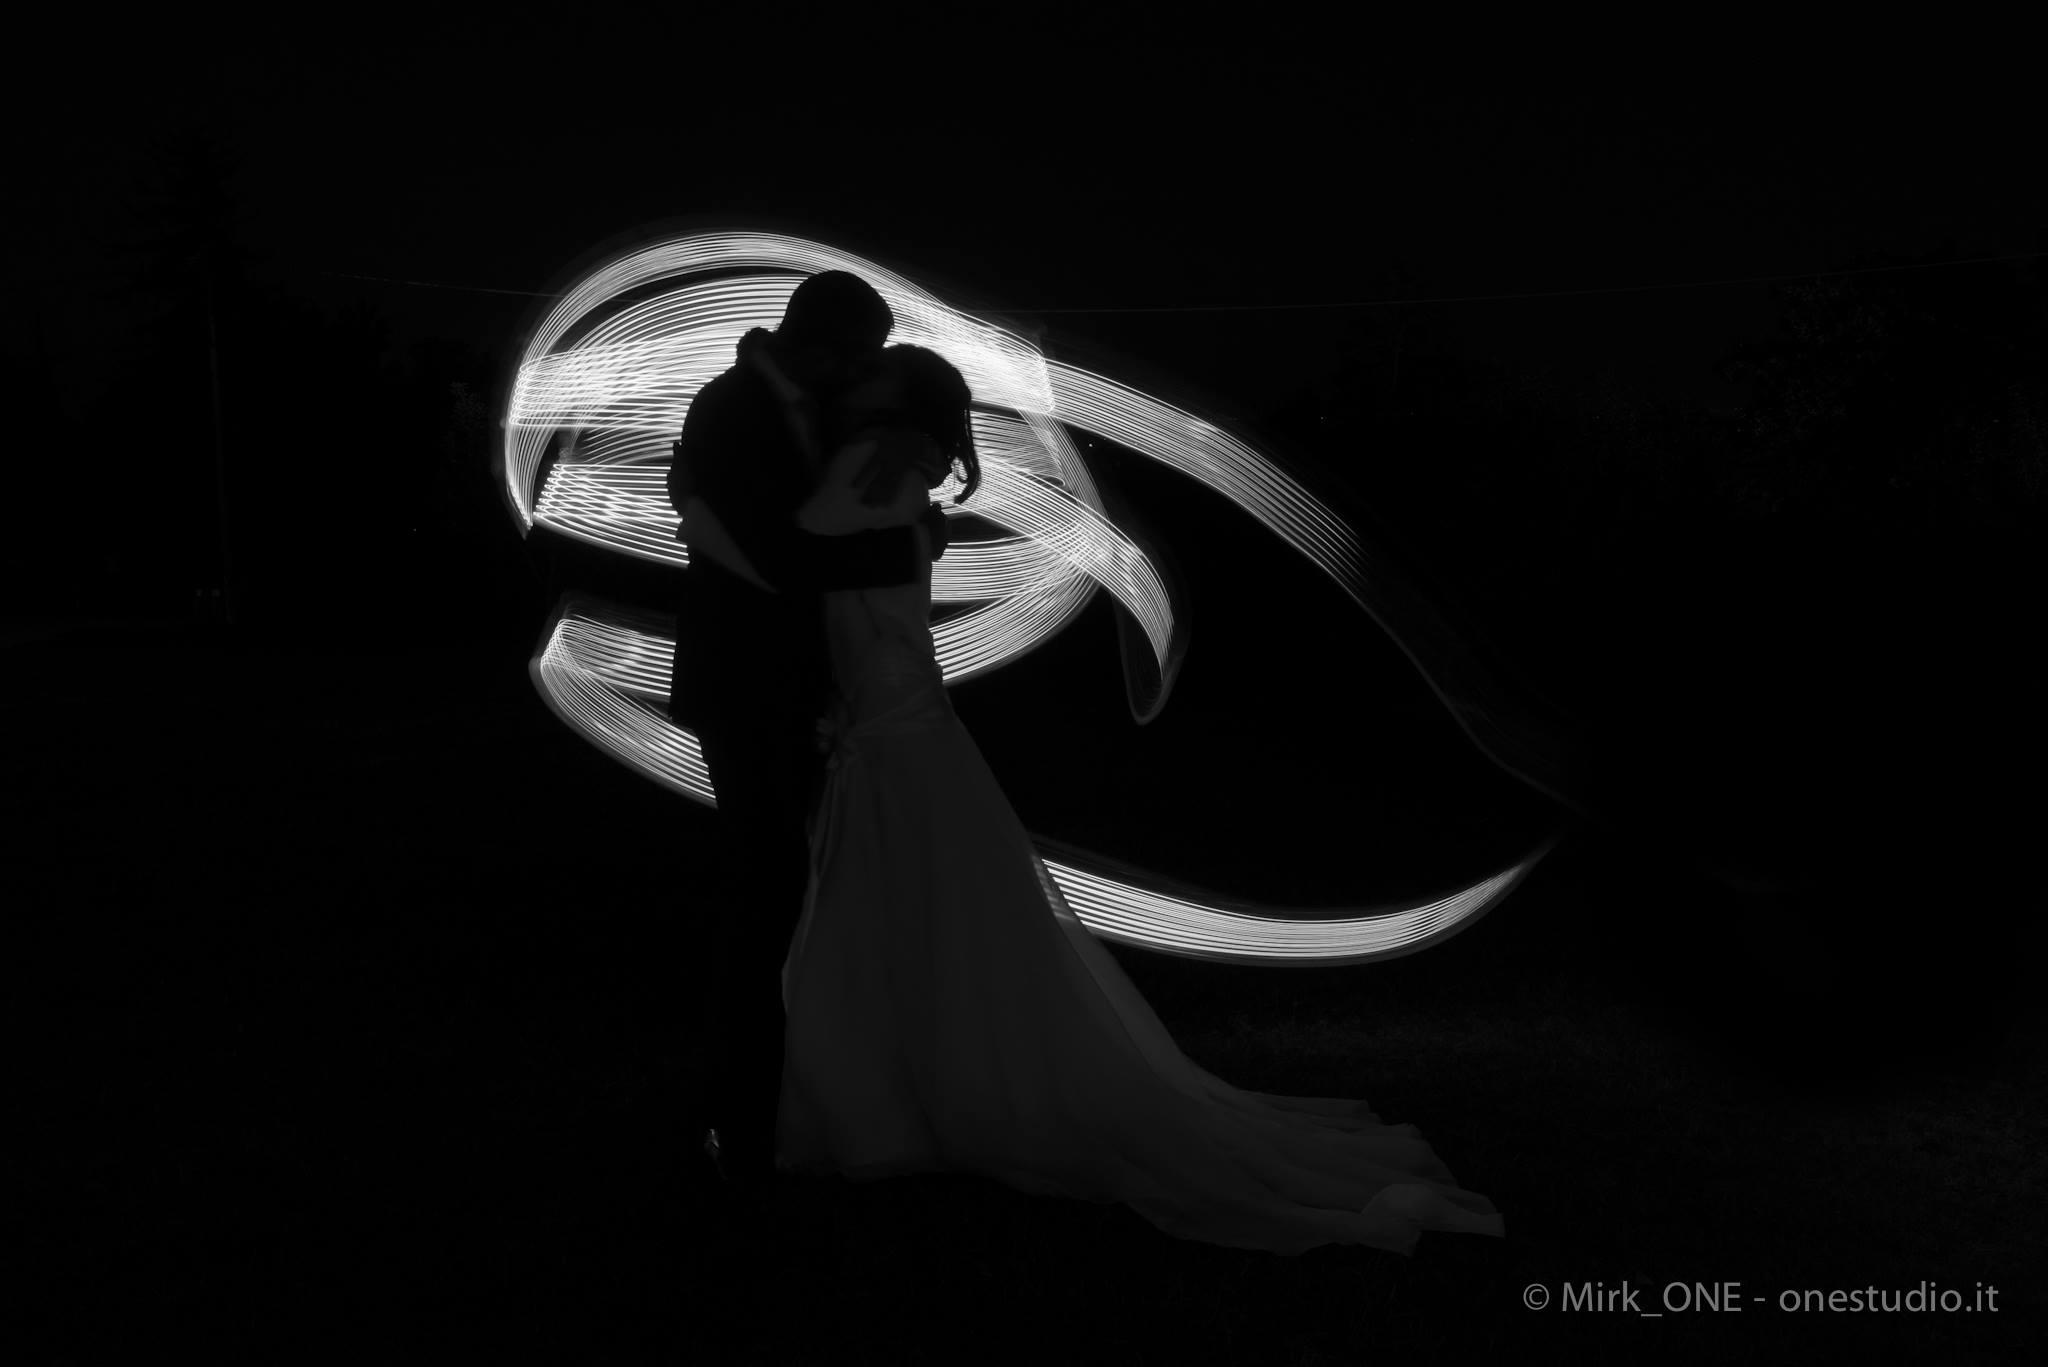 https://lnx.mirkone.it/wp-content/uploads/2015/07/mirk_ONE-fotografo-matrimonio-00836.jpg